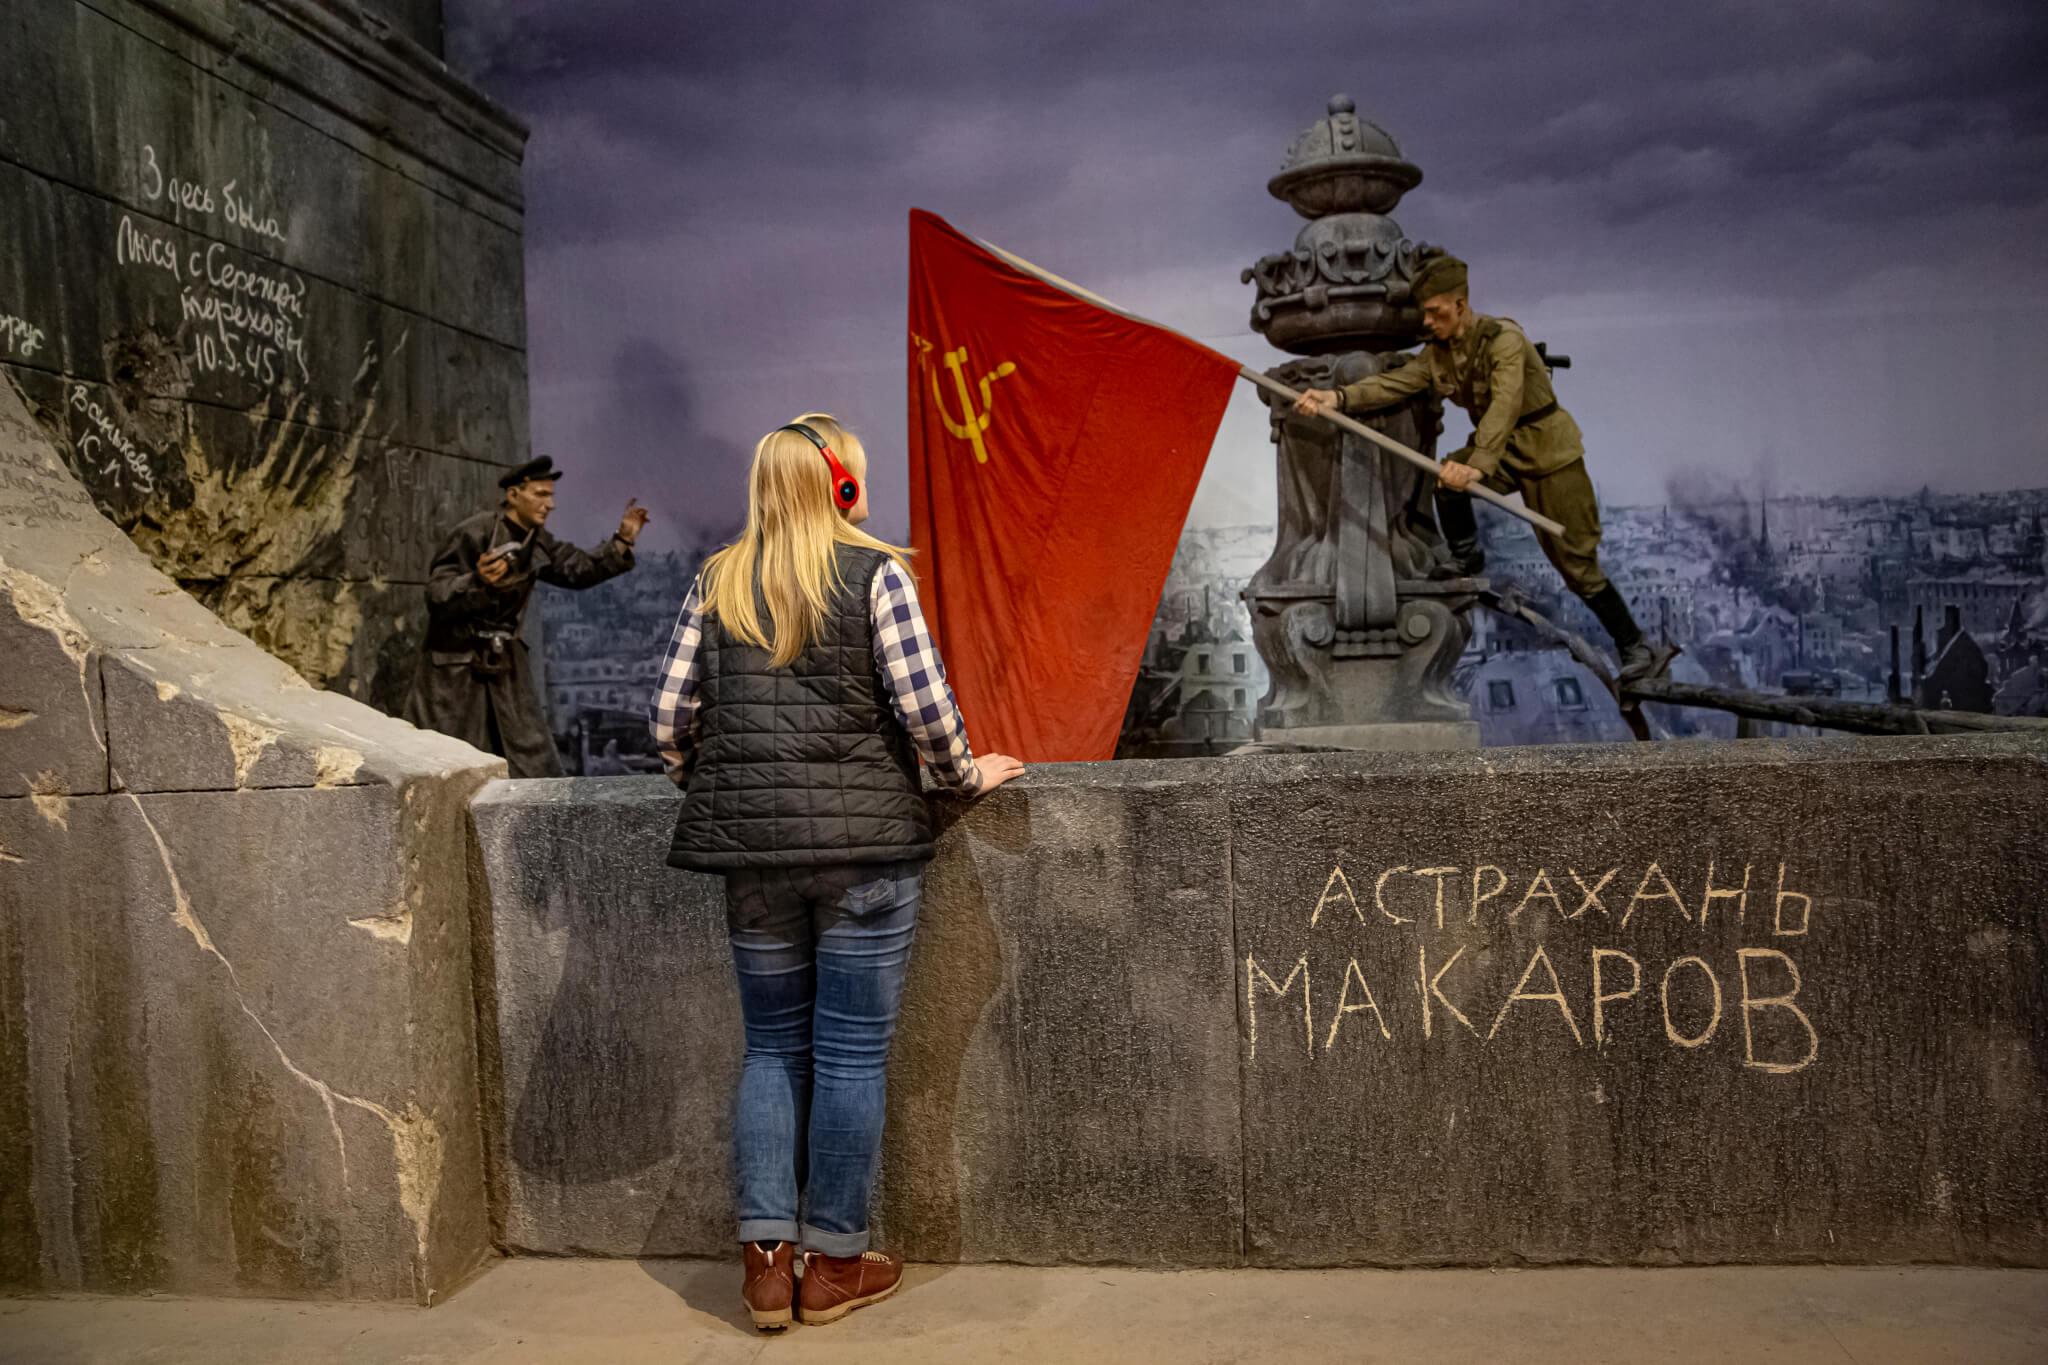 Семейный Мамаход памяти на панораму «Дорога через войну»